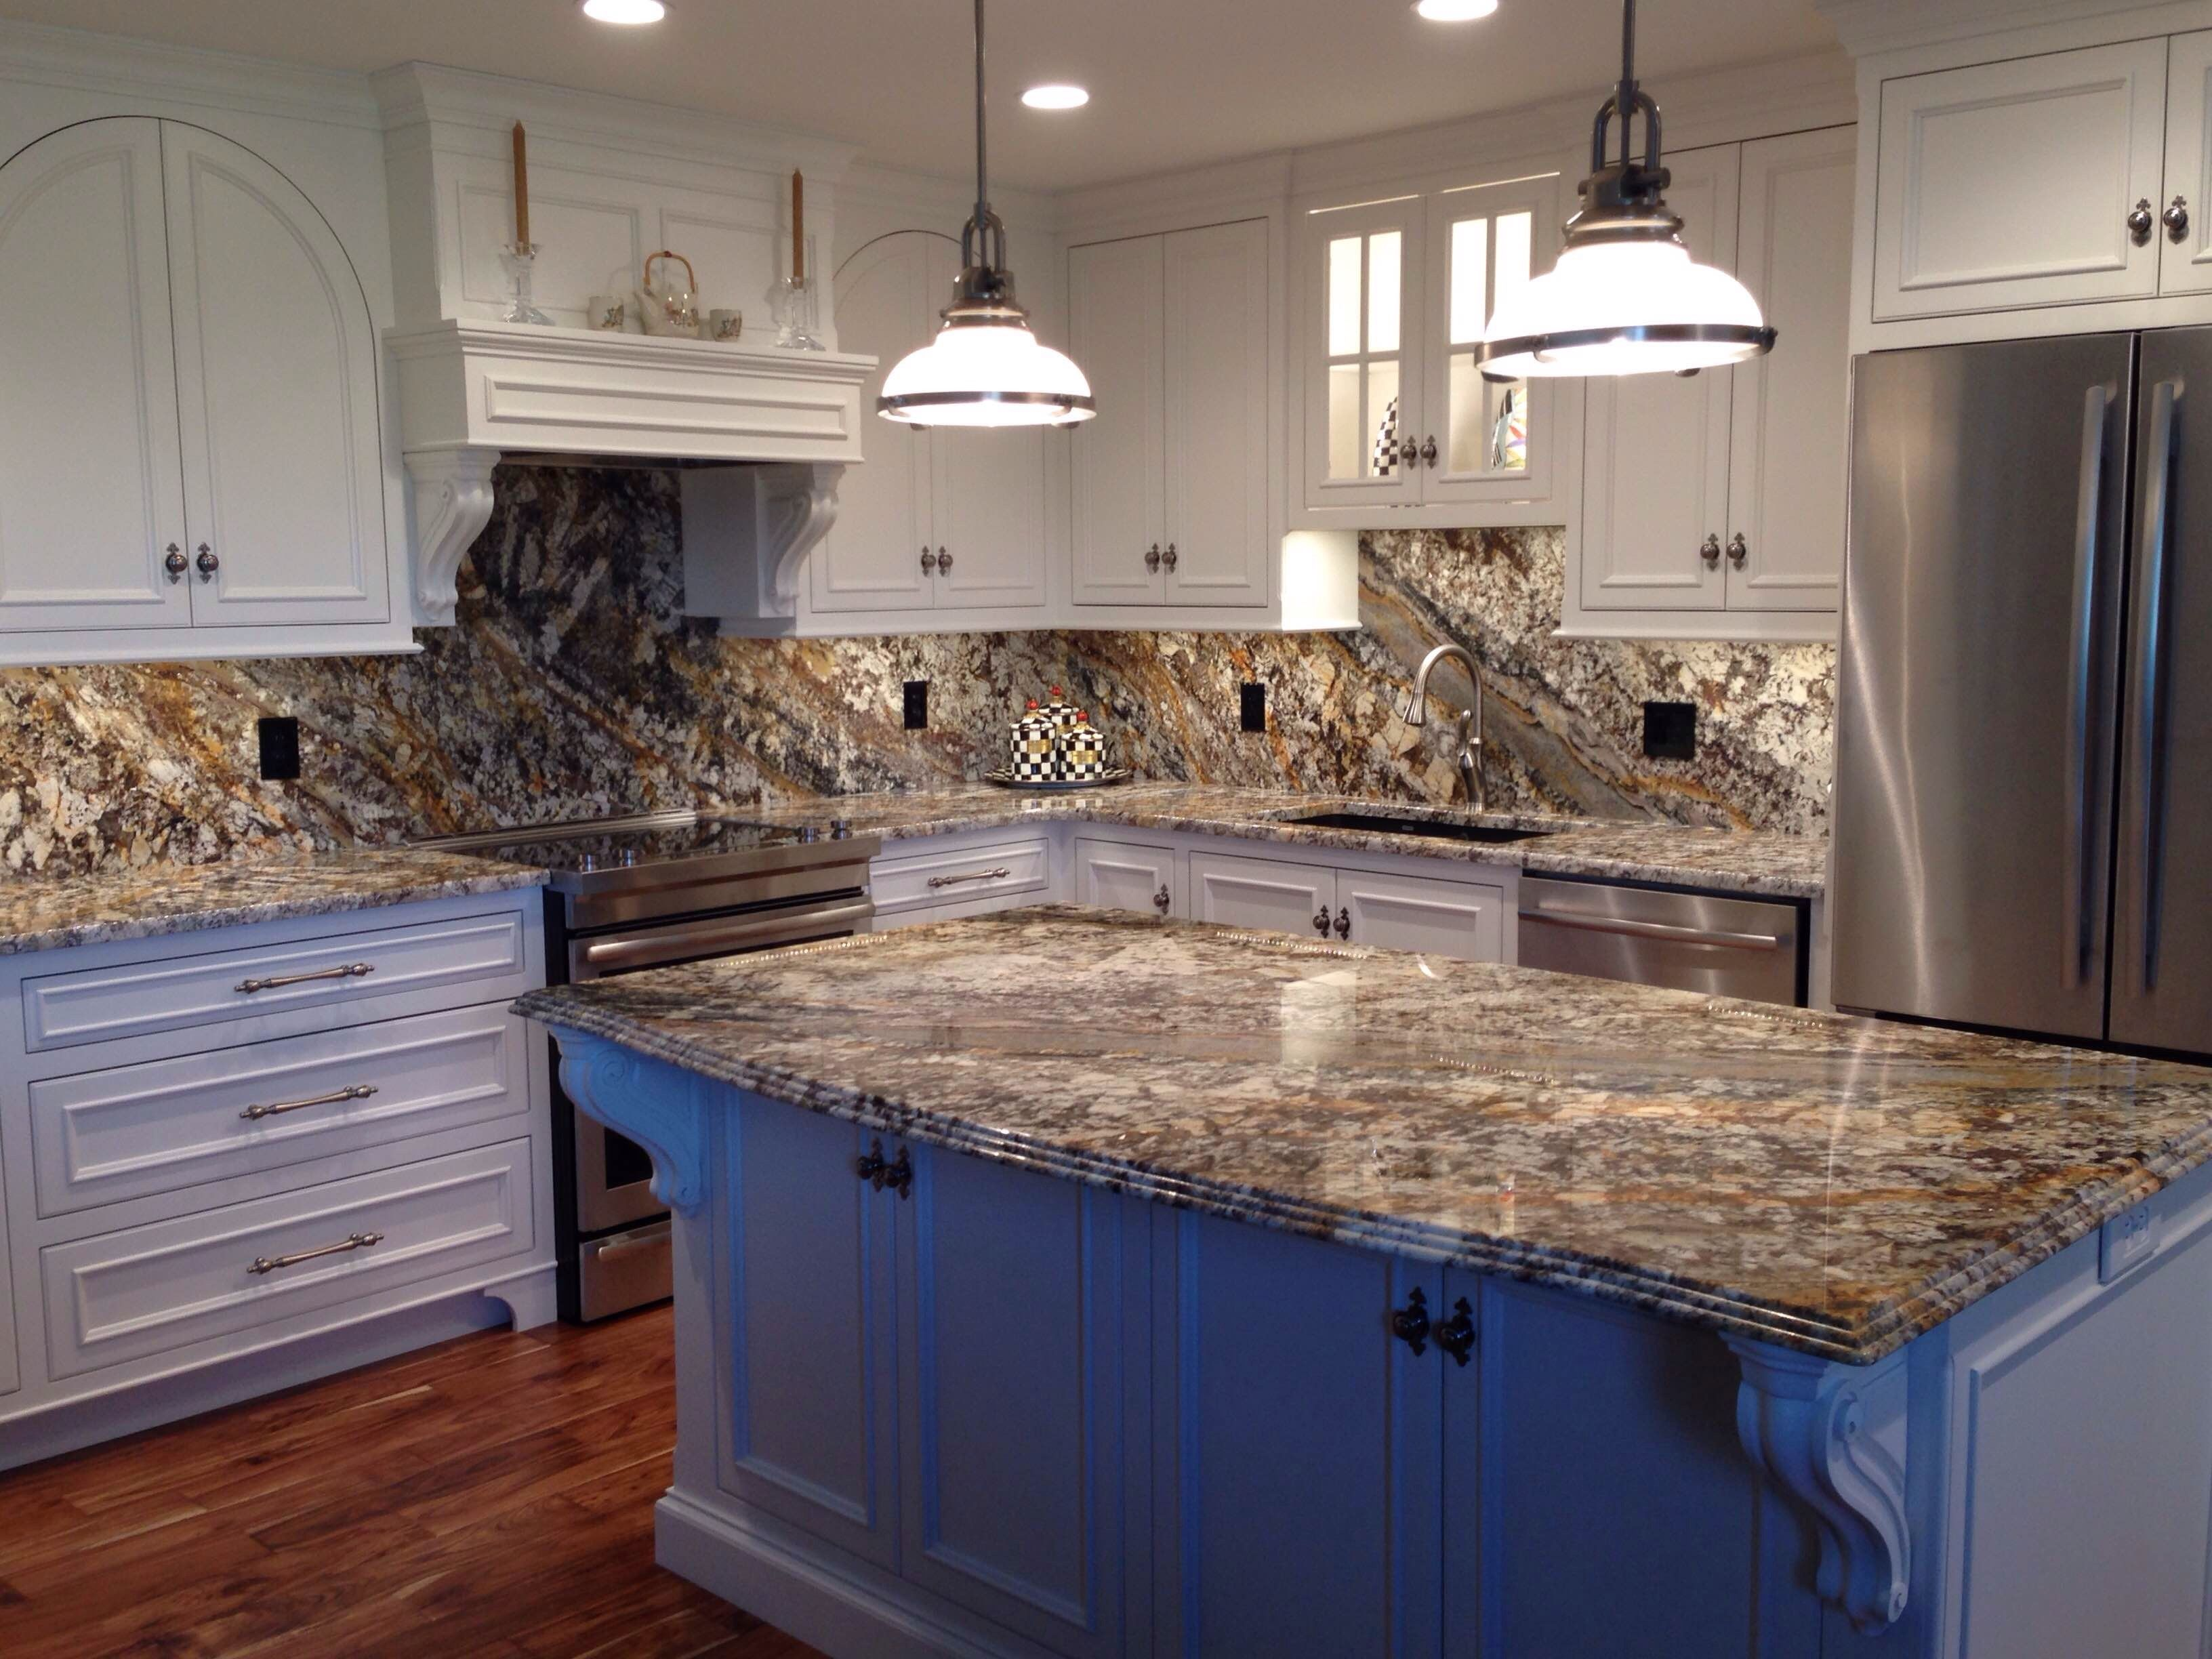 Treasure Island Granite Counter Tops And Back Splash Purchased And